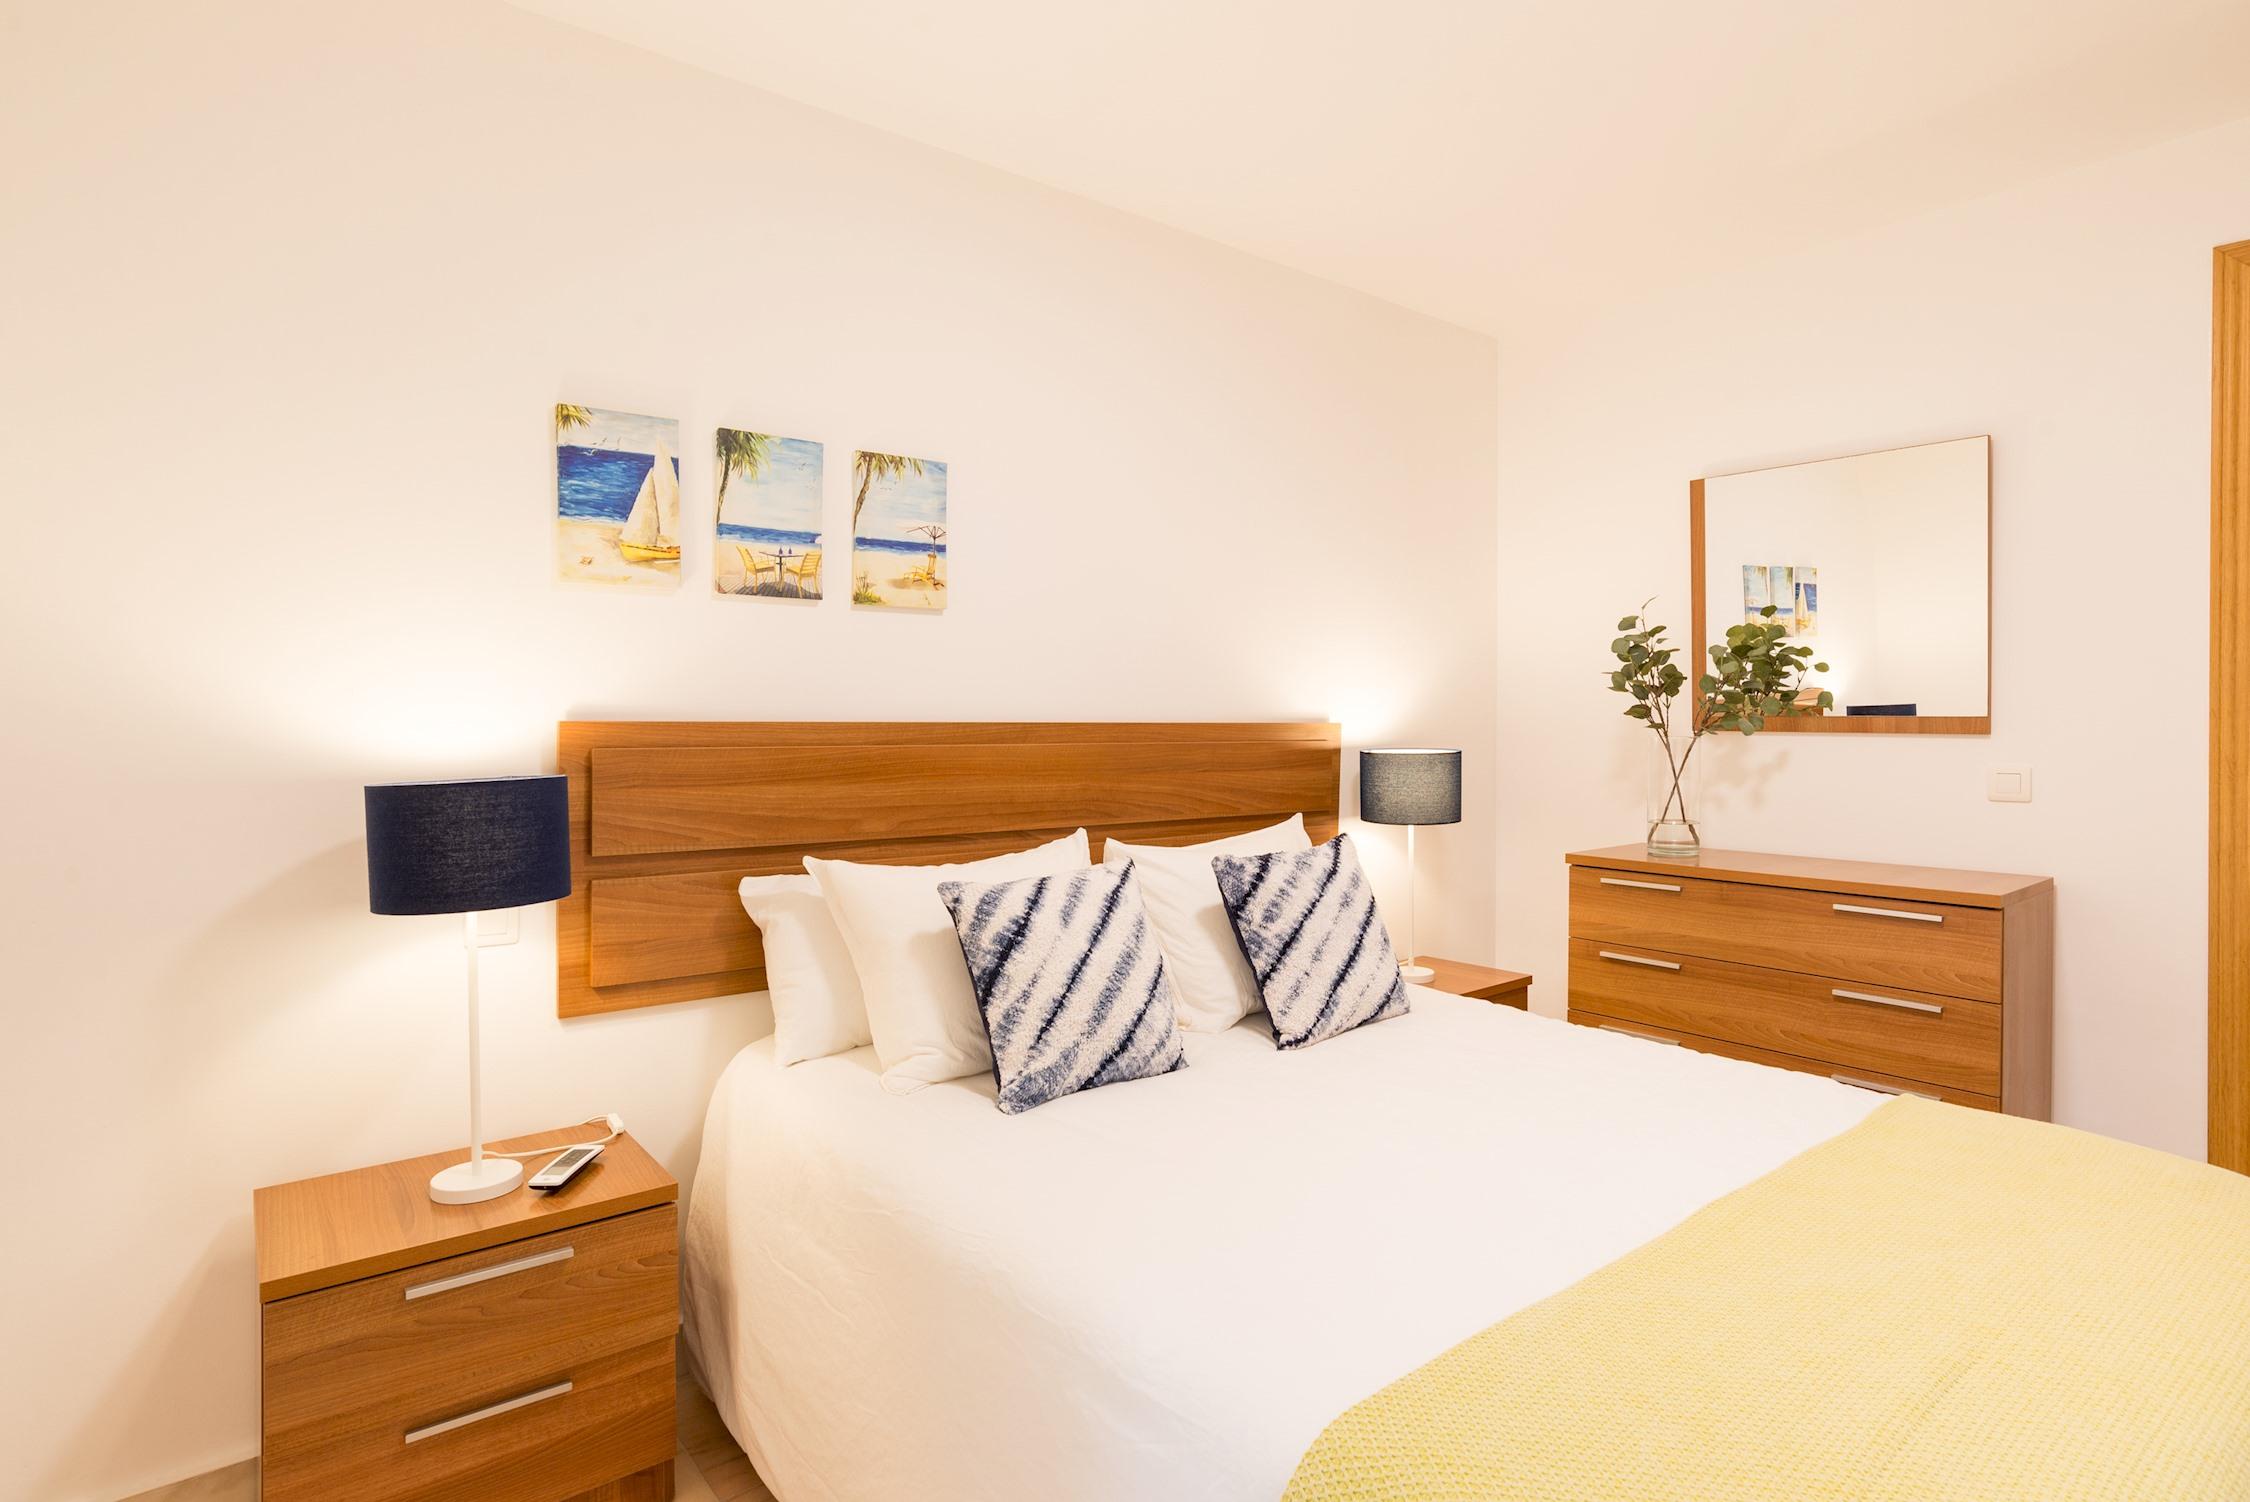 Apartment MalagaSuite Marbella Beach photo 25528490